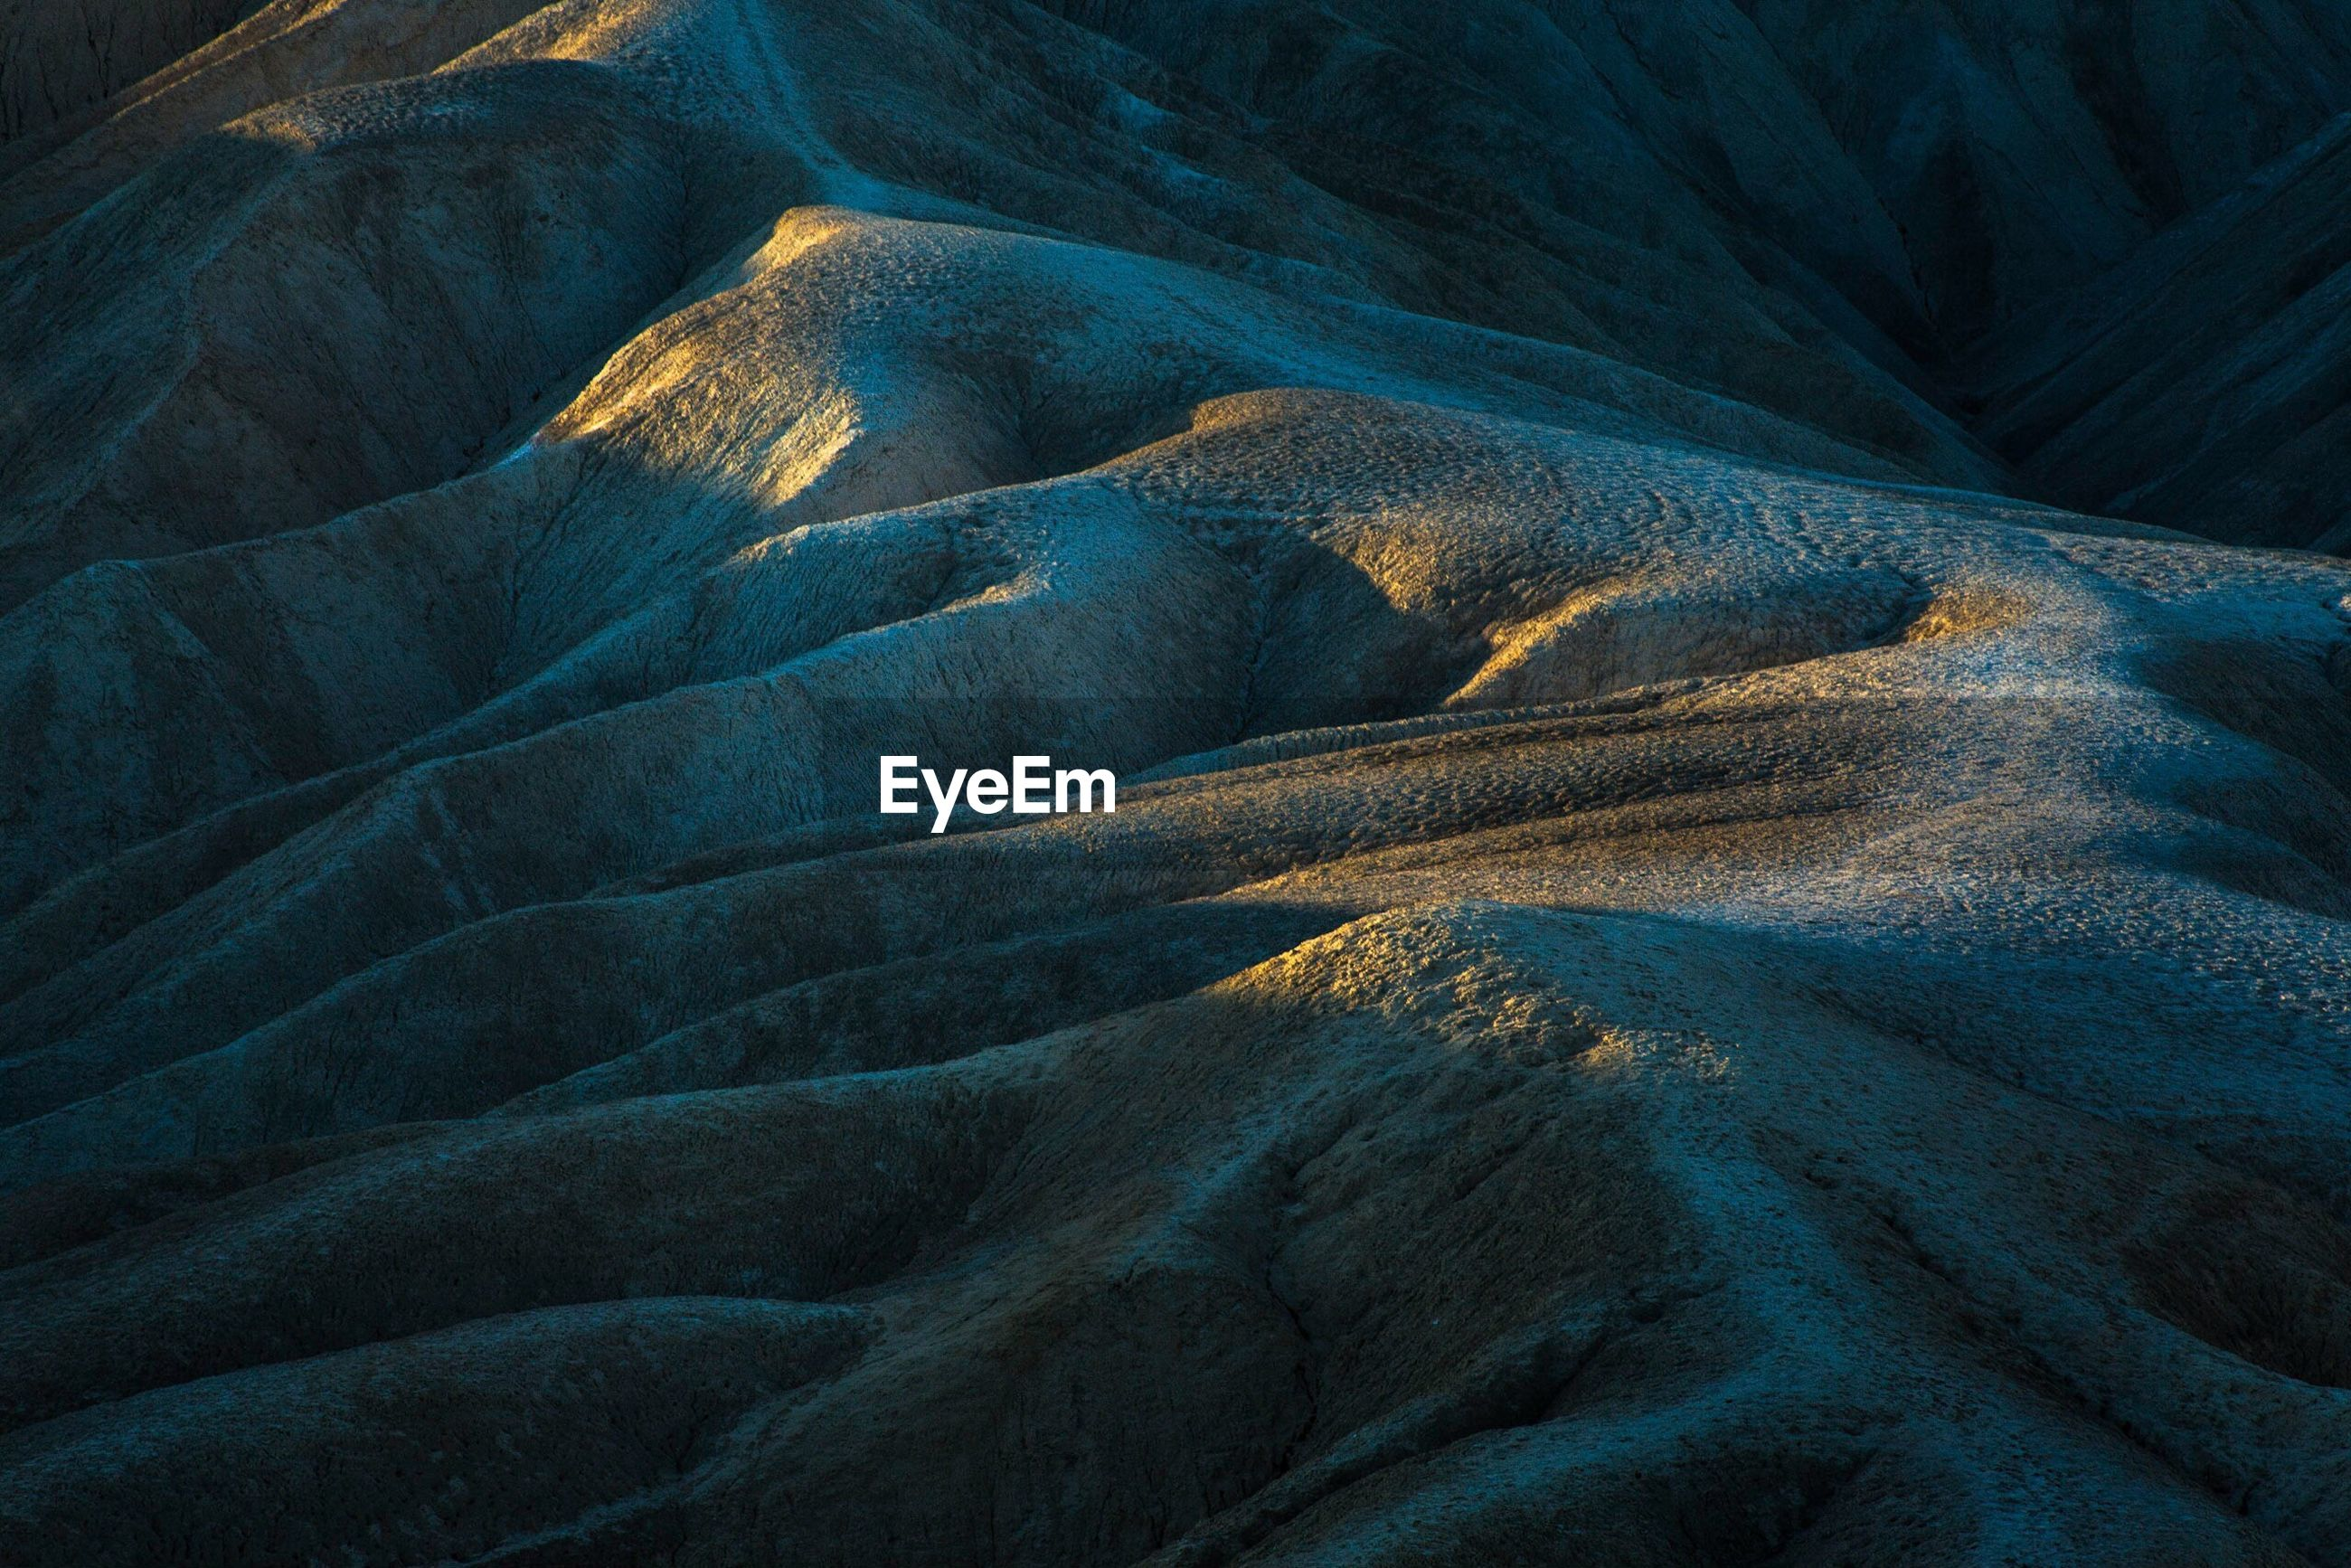 Full frame shot of dramatic landscape at zabriskie point in death valley national park